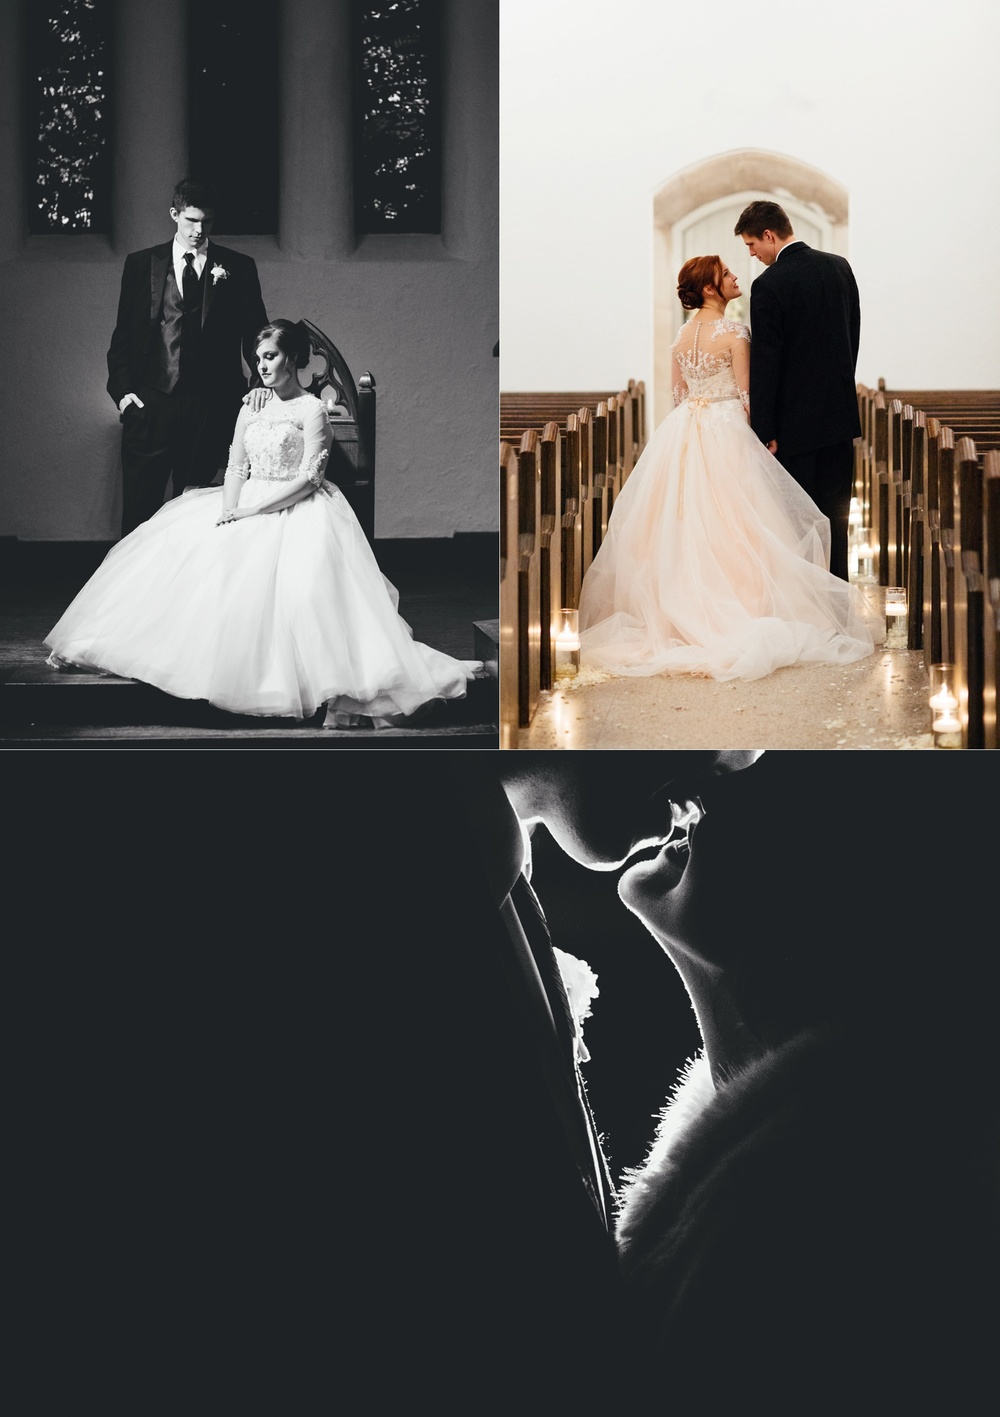 jake-and-katie-wedding-favorites-2015-40